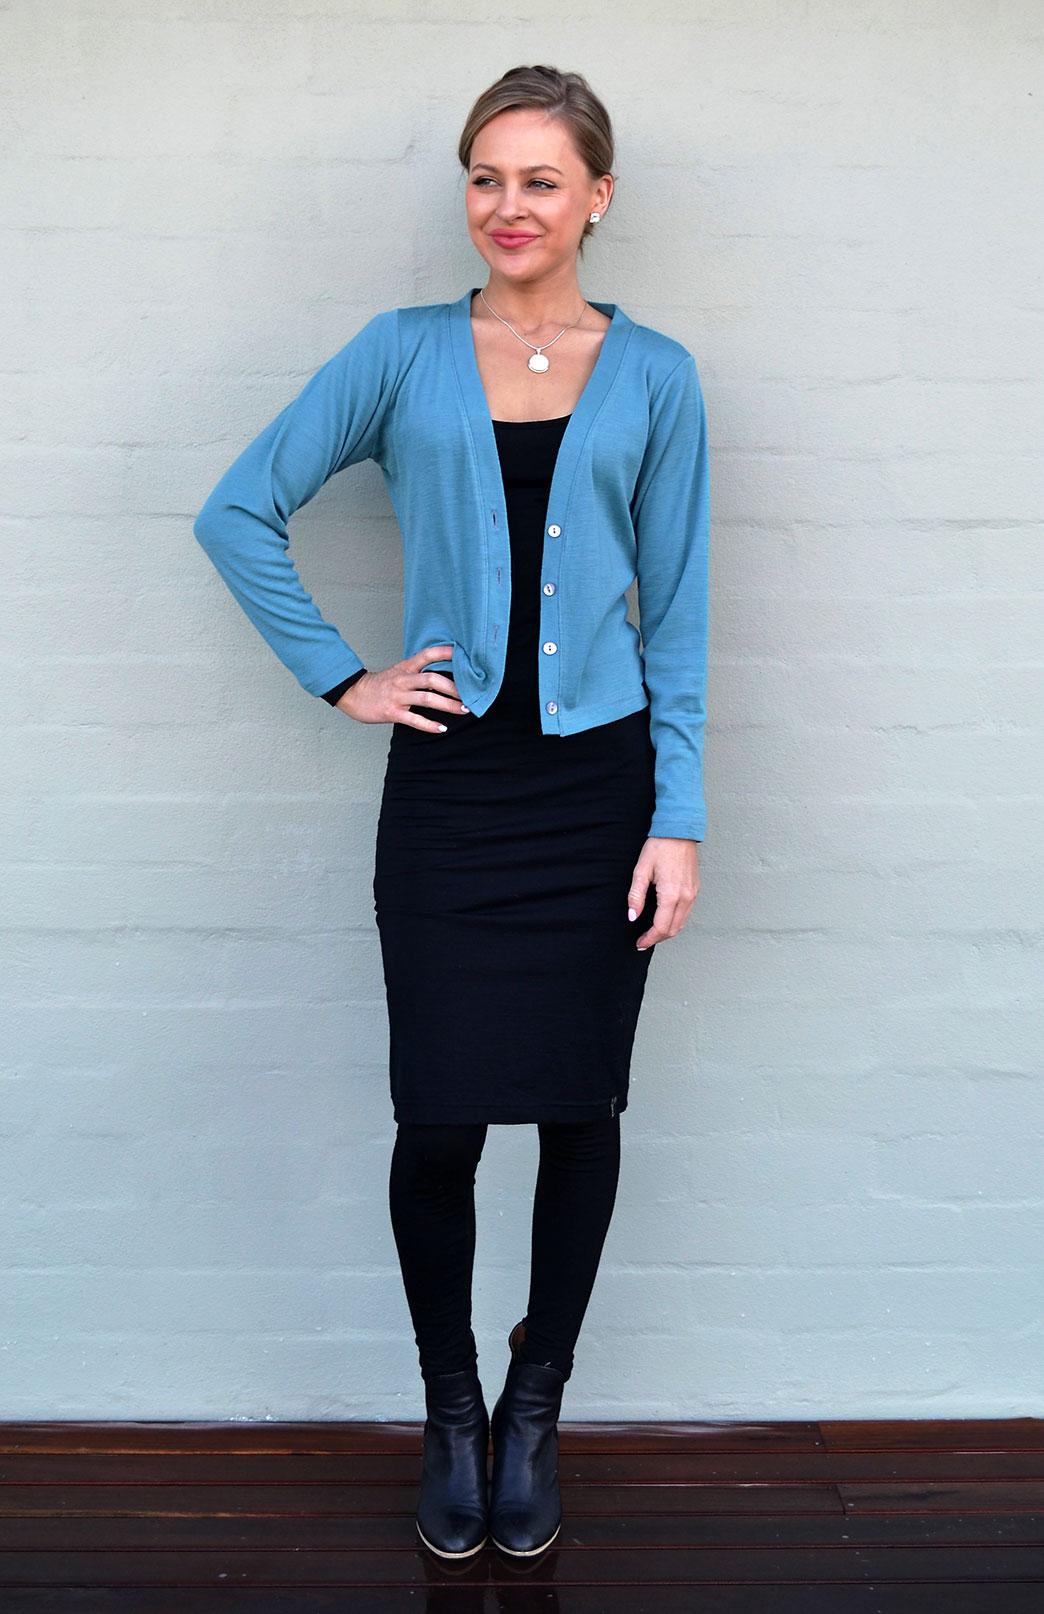 Crop Cardigan - Long Sleeved - Women's Petrel Green Long Sleeve Merino Wool Cropped Cardigan with Buttons - Smitten Merino Tasmania Australia